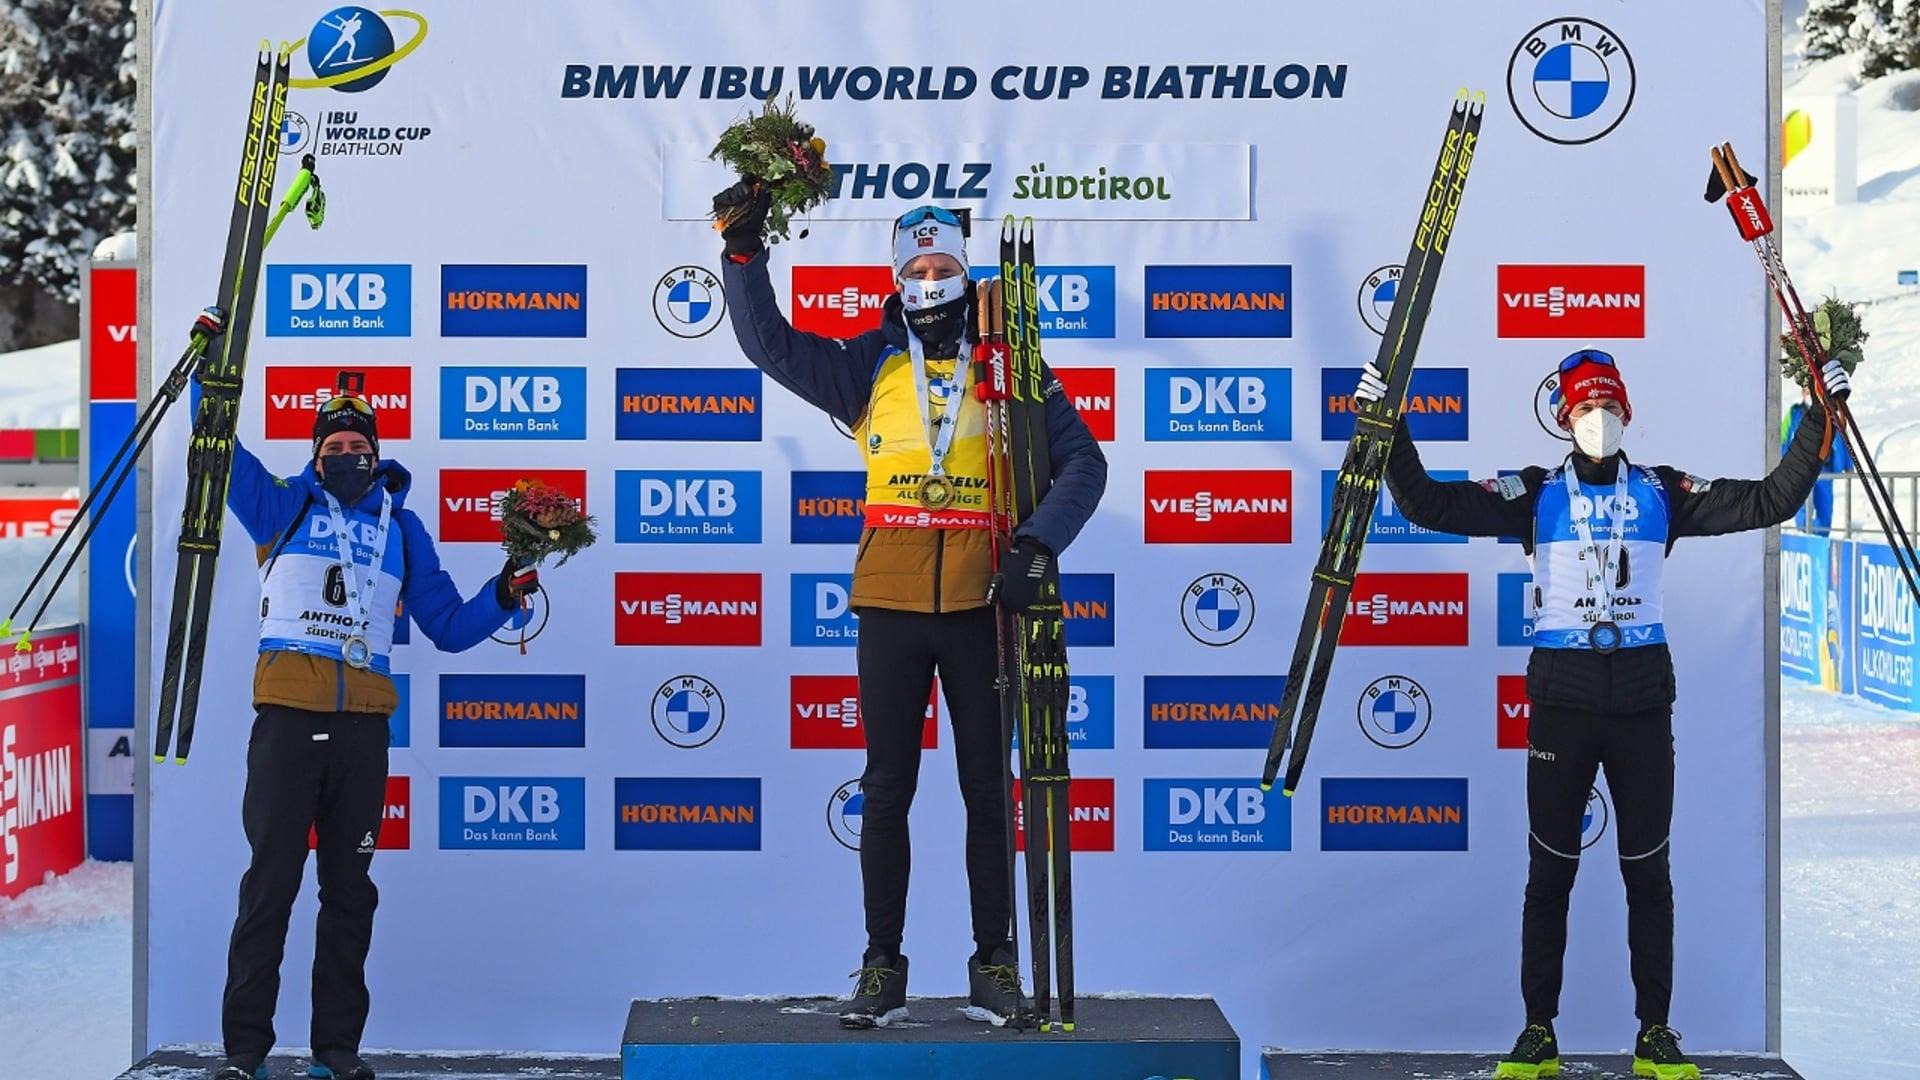 24.01.2021 - L'ultima vittoria ad Anterselva va a Johannes Thingnes Bø